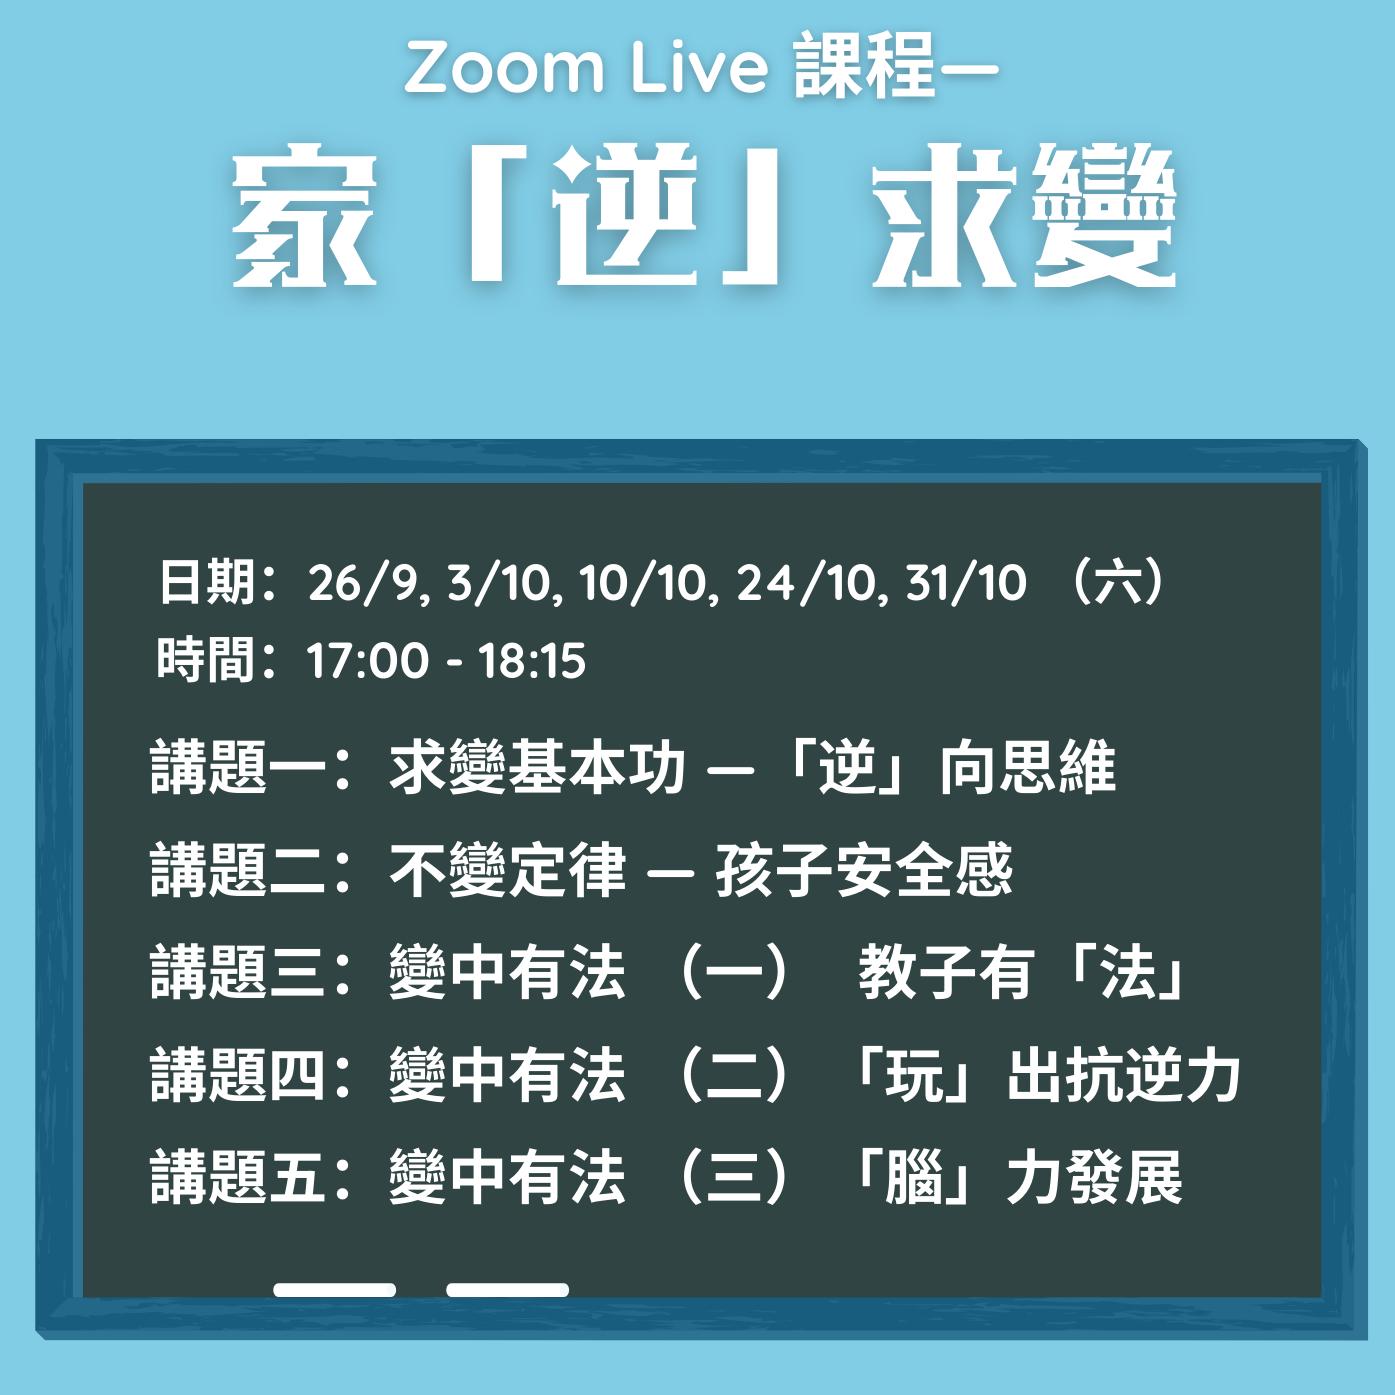 Zoom Live課程—「逆」·「情」下的家